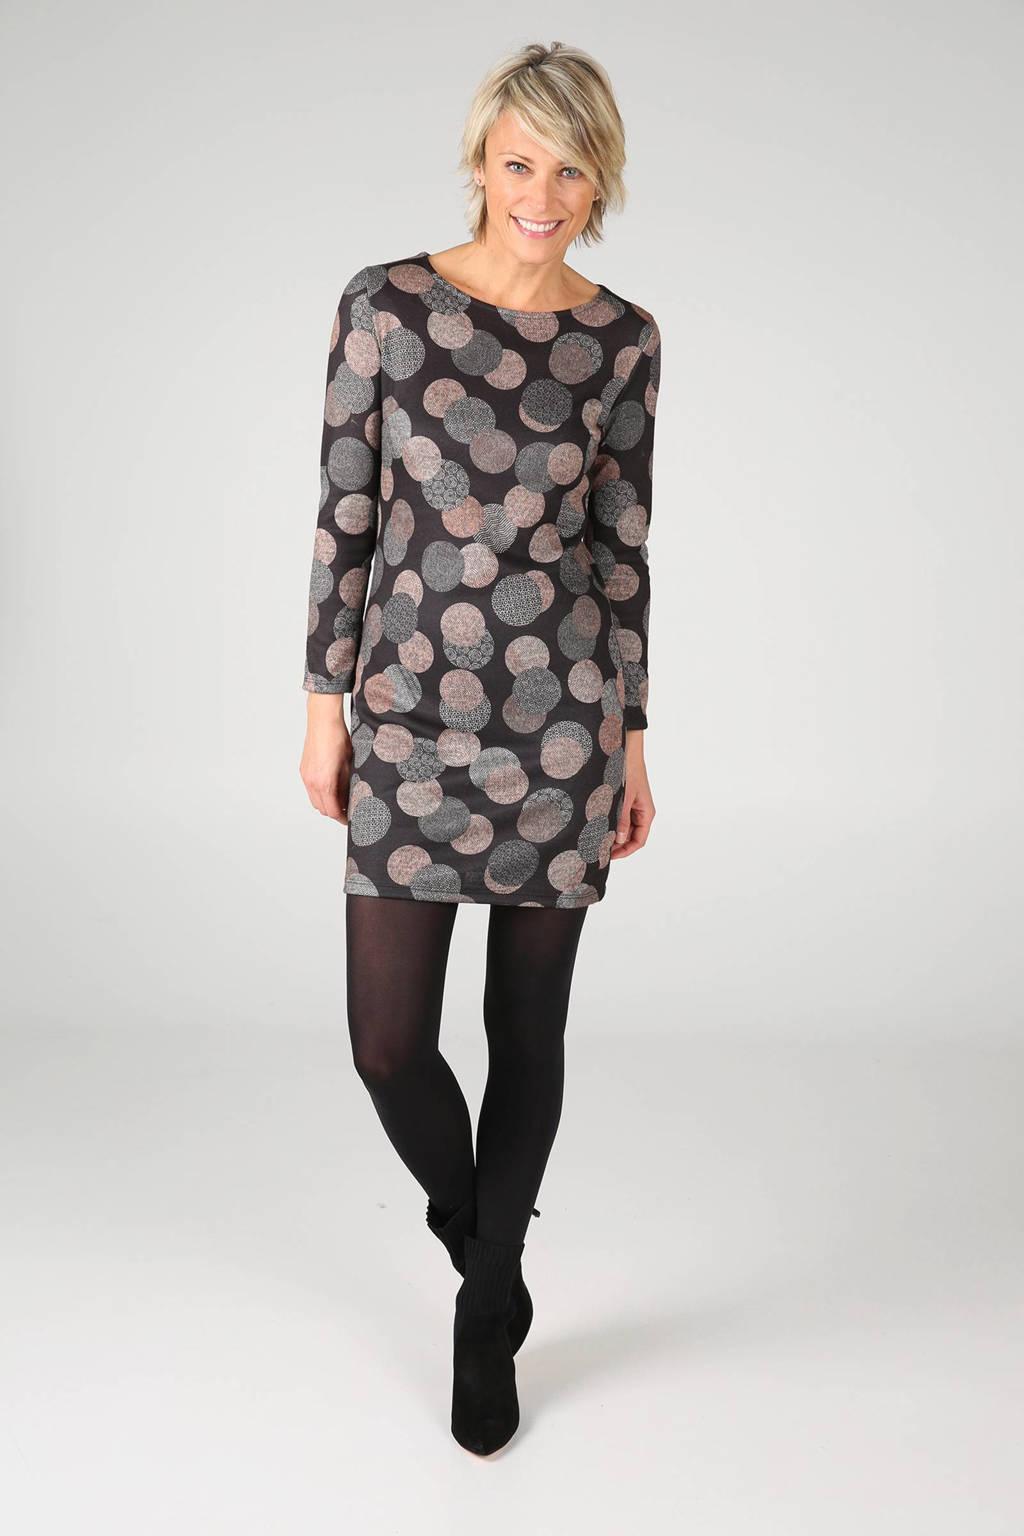 Cassis jurk met stippen, Antraciet/lichtbruin